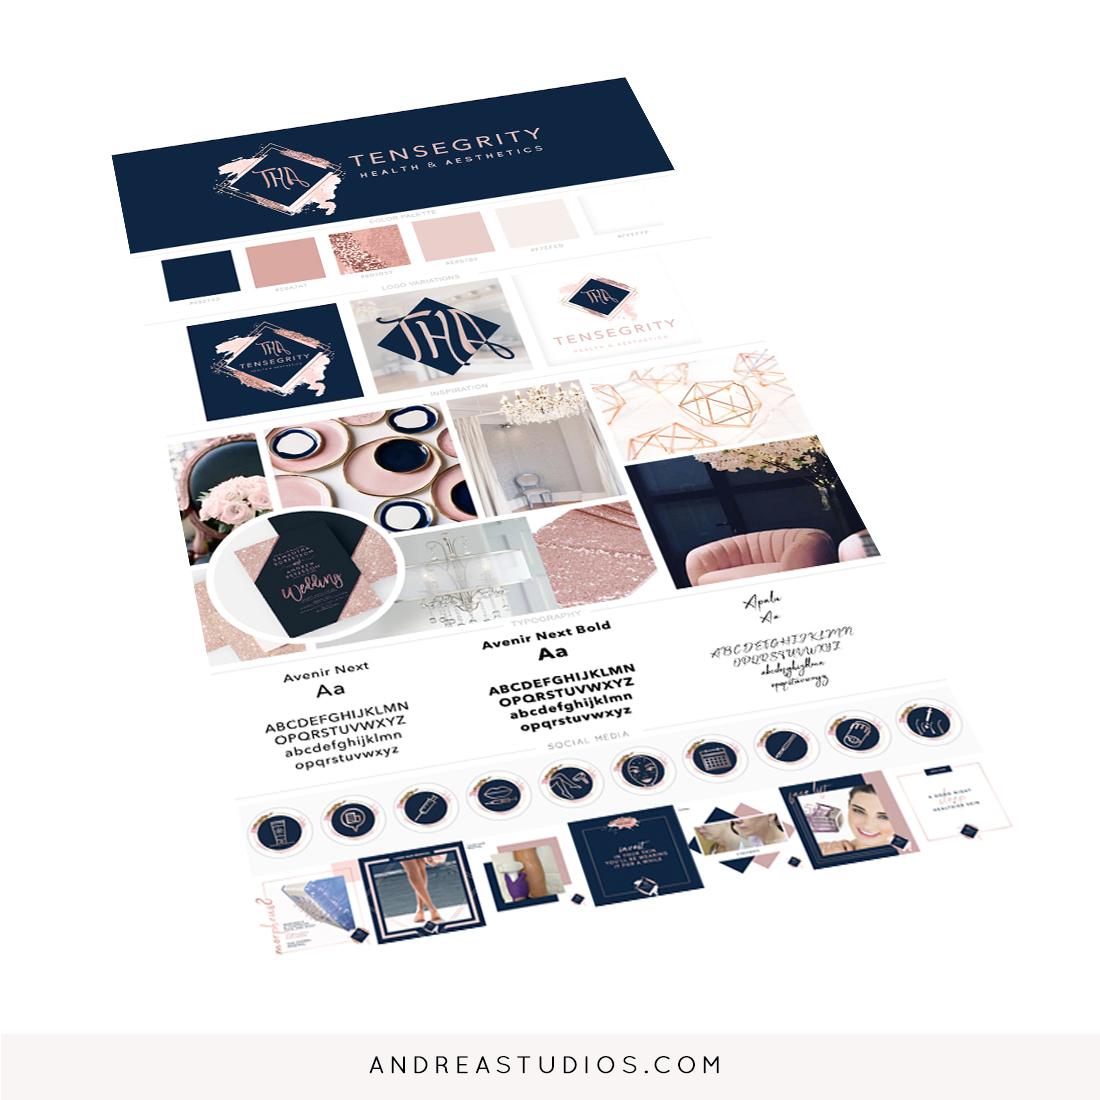 Tensegrity Health & Aesthetics Brand Design, Social Media, Web Design and Online Marketing